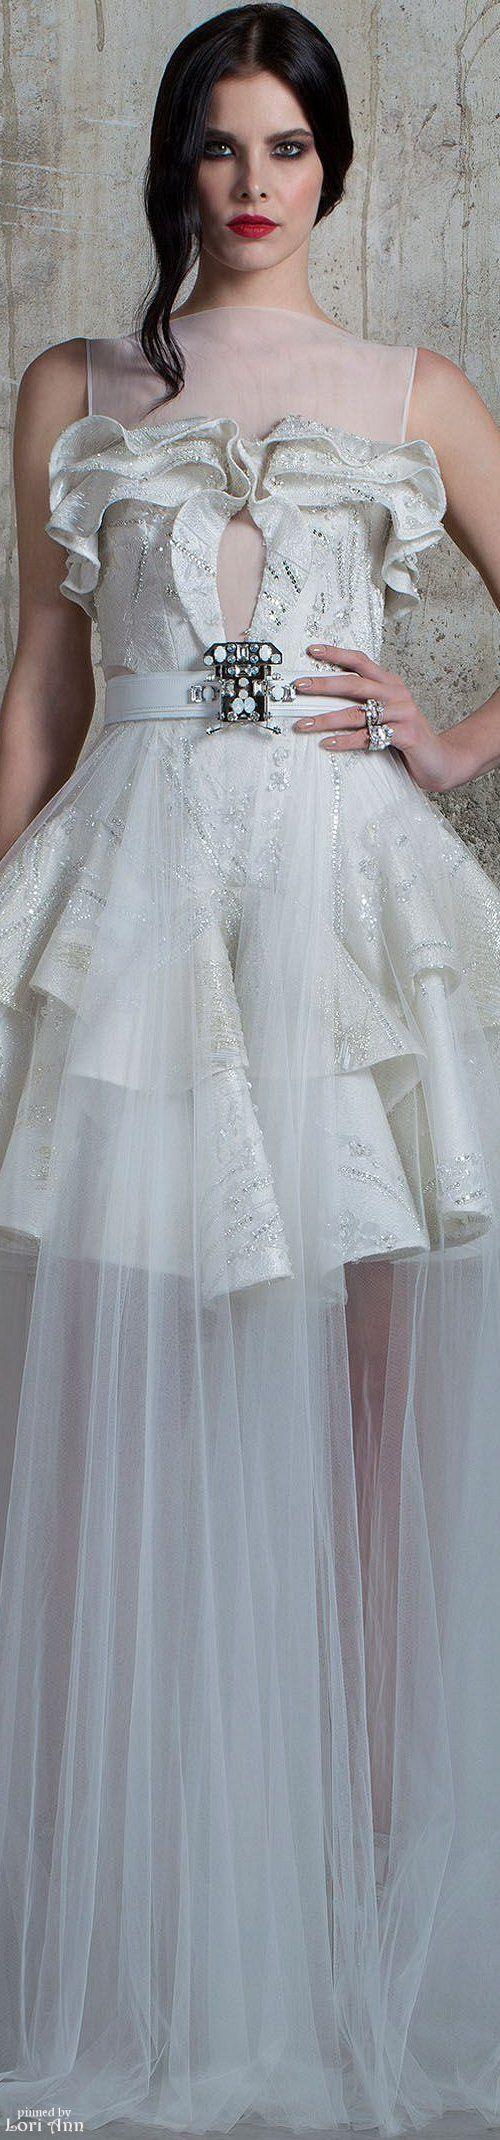 83 best Basil Soda images on Pinterest | Basil soda, Cute dresses ...